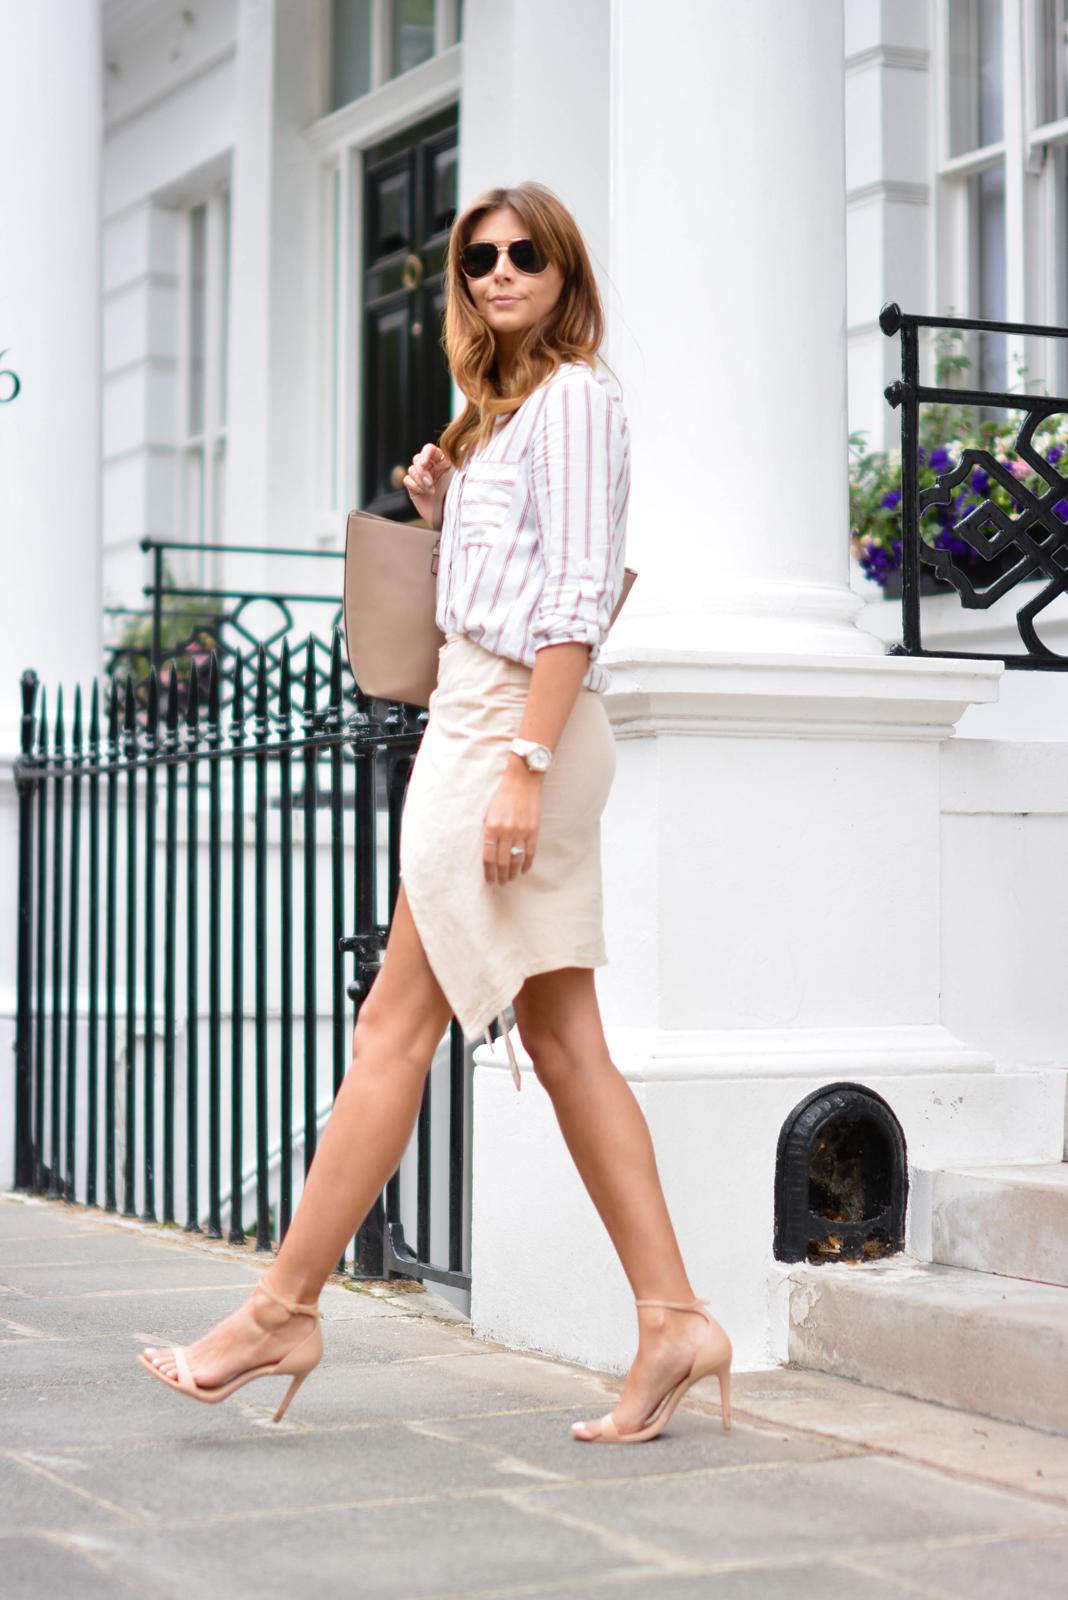 EJSTYLE - Emma Hill wears Zara stripe shirt, beige wrap skirt, nude strappy sandals, Mango saffiano tote bag, aviator sunglasses, Summer OOTD, london street style